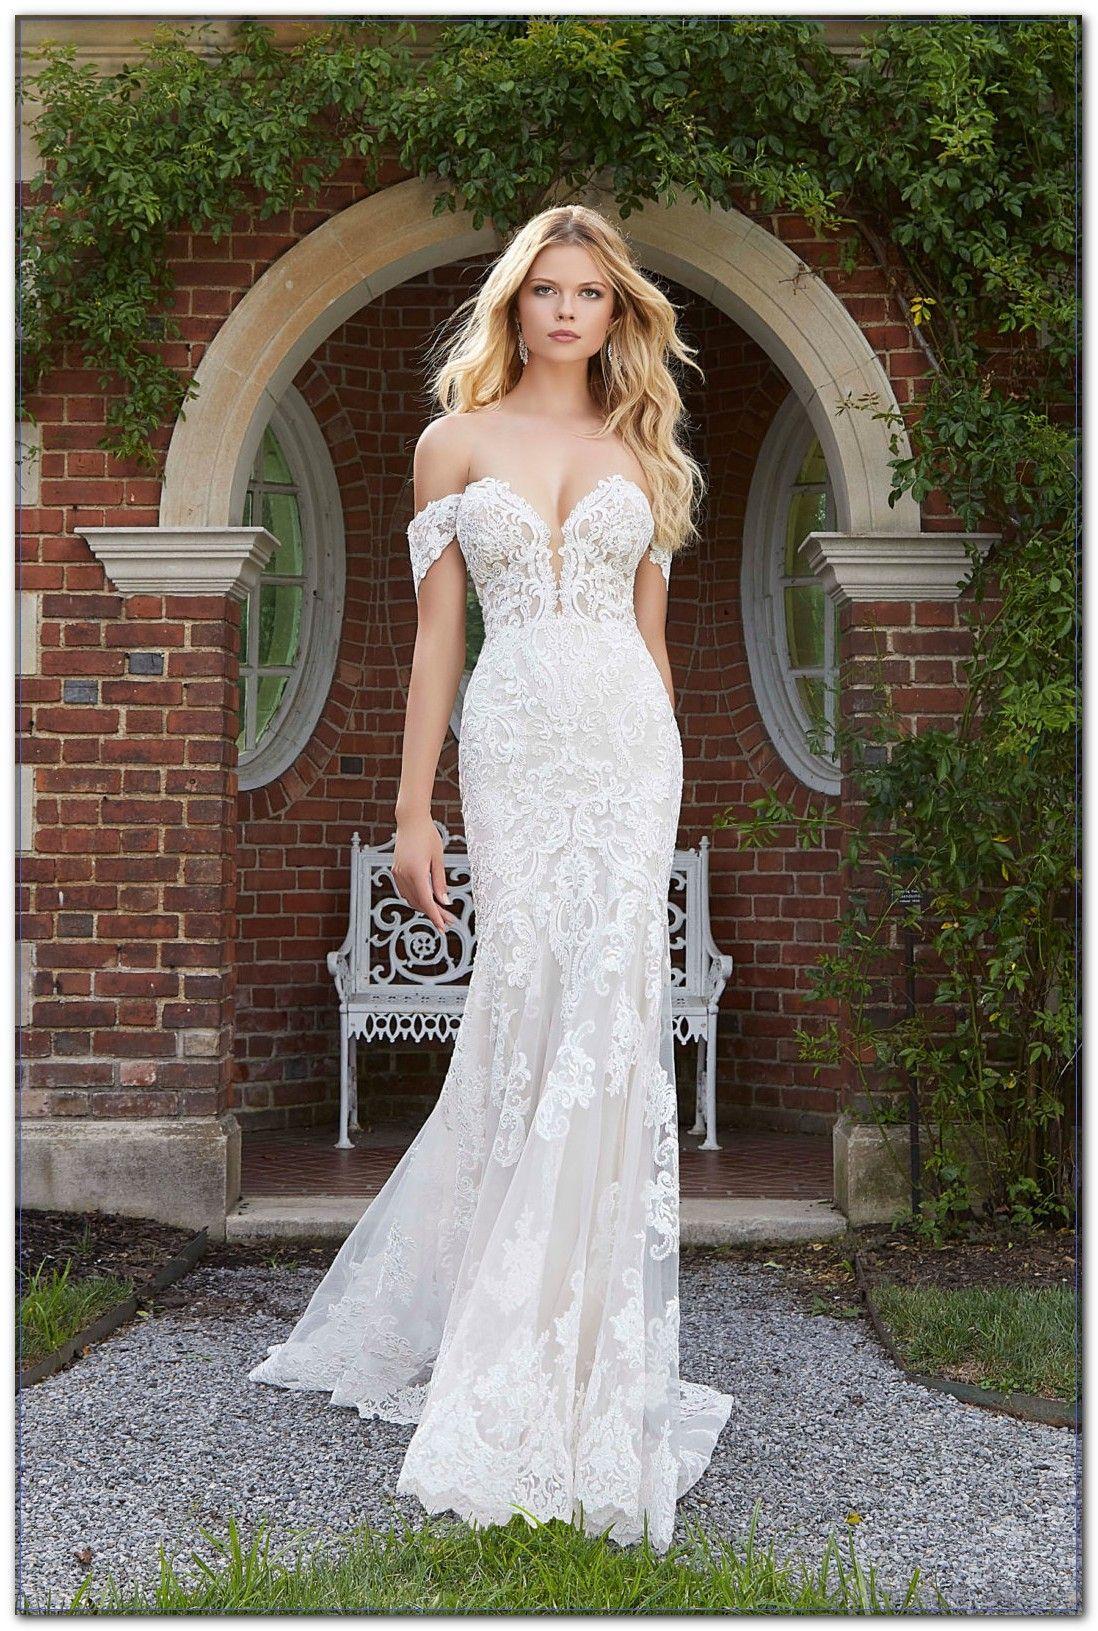 Weddings Dress Shortcuts – The Easy Way